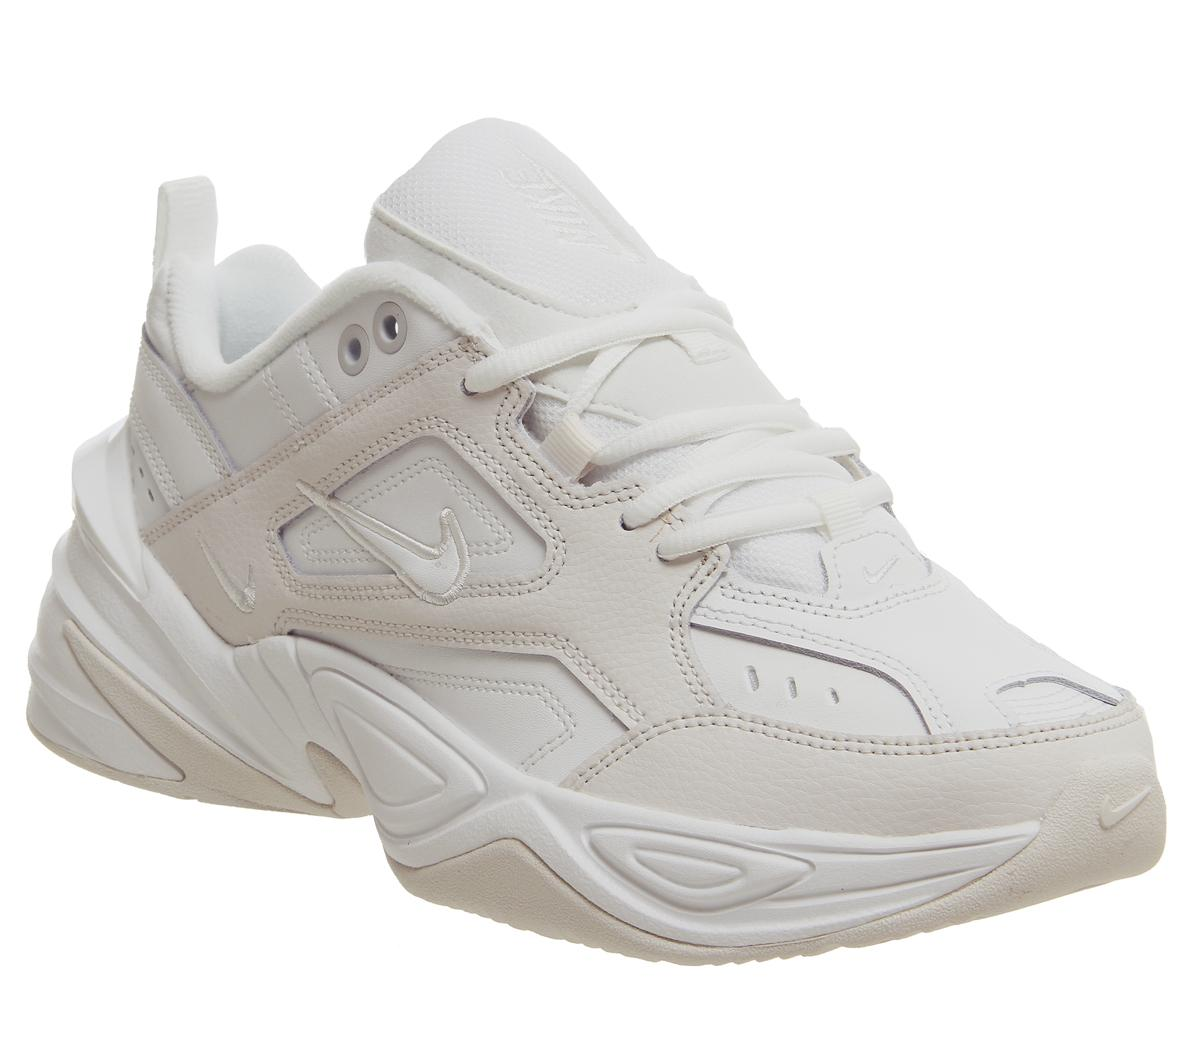 Nike M2k Tekno Phantom Summit White - Unisex Sports